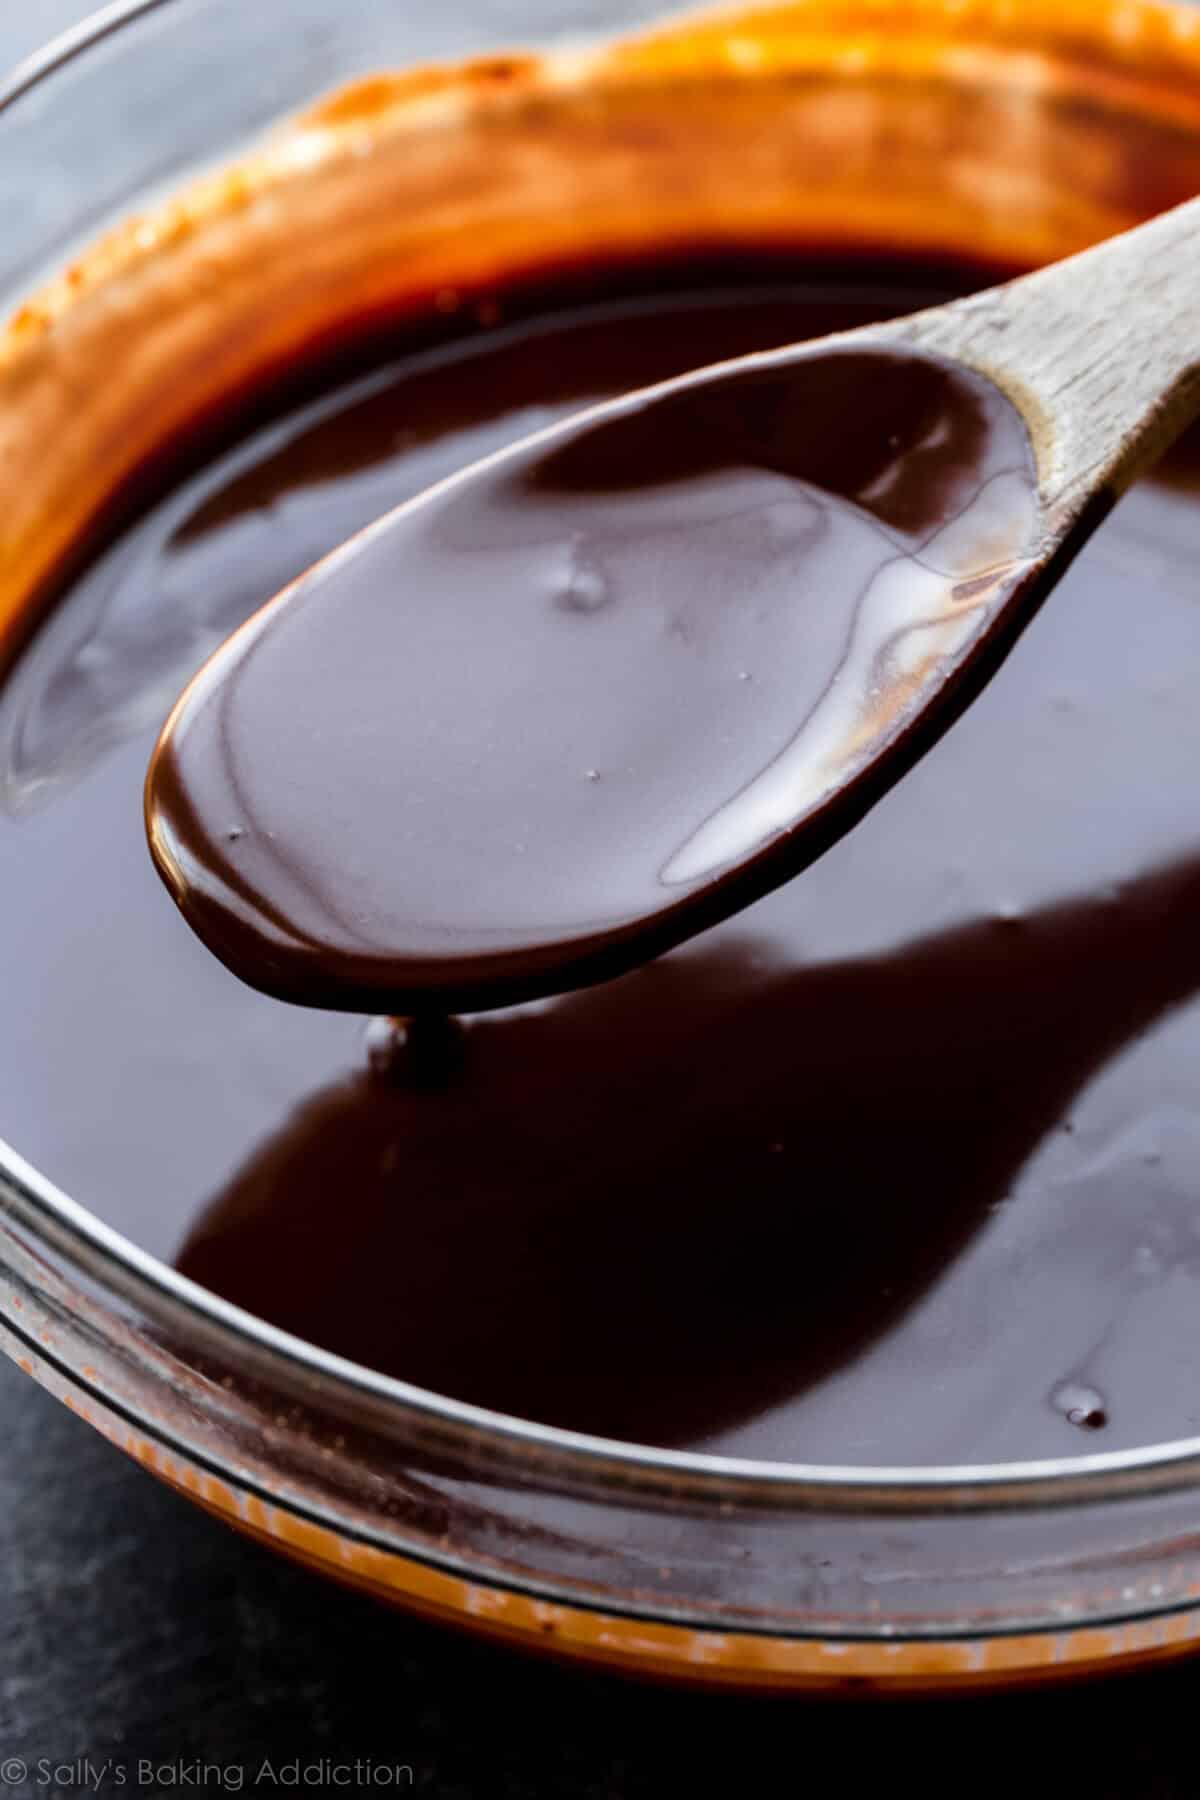 How to make 7 ingredient gluten free and vegan chocolate coconut tart on sallysbakingaddiction.com